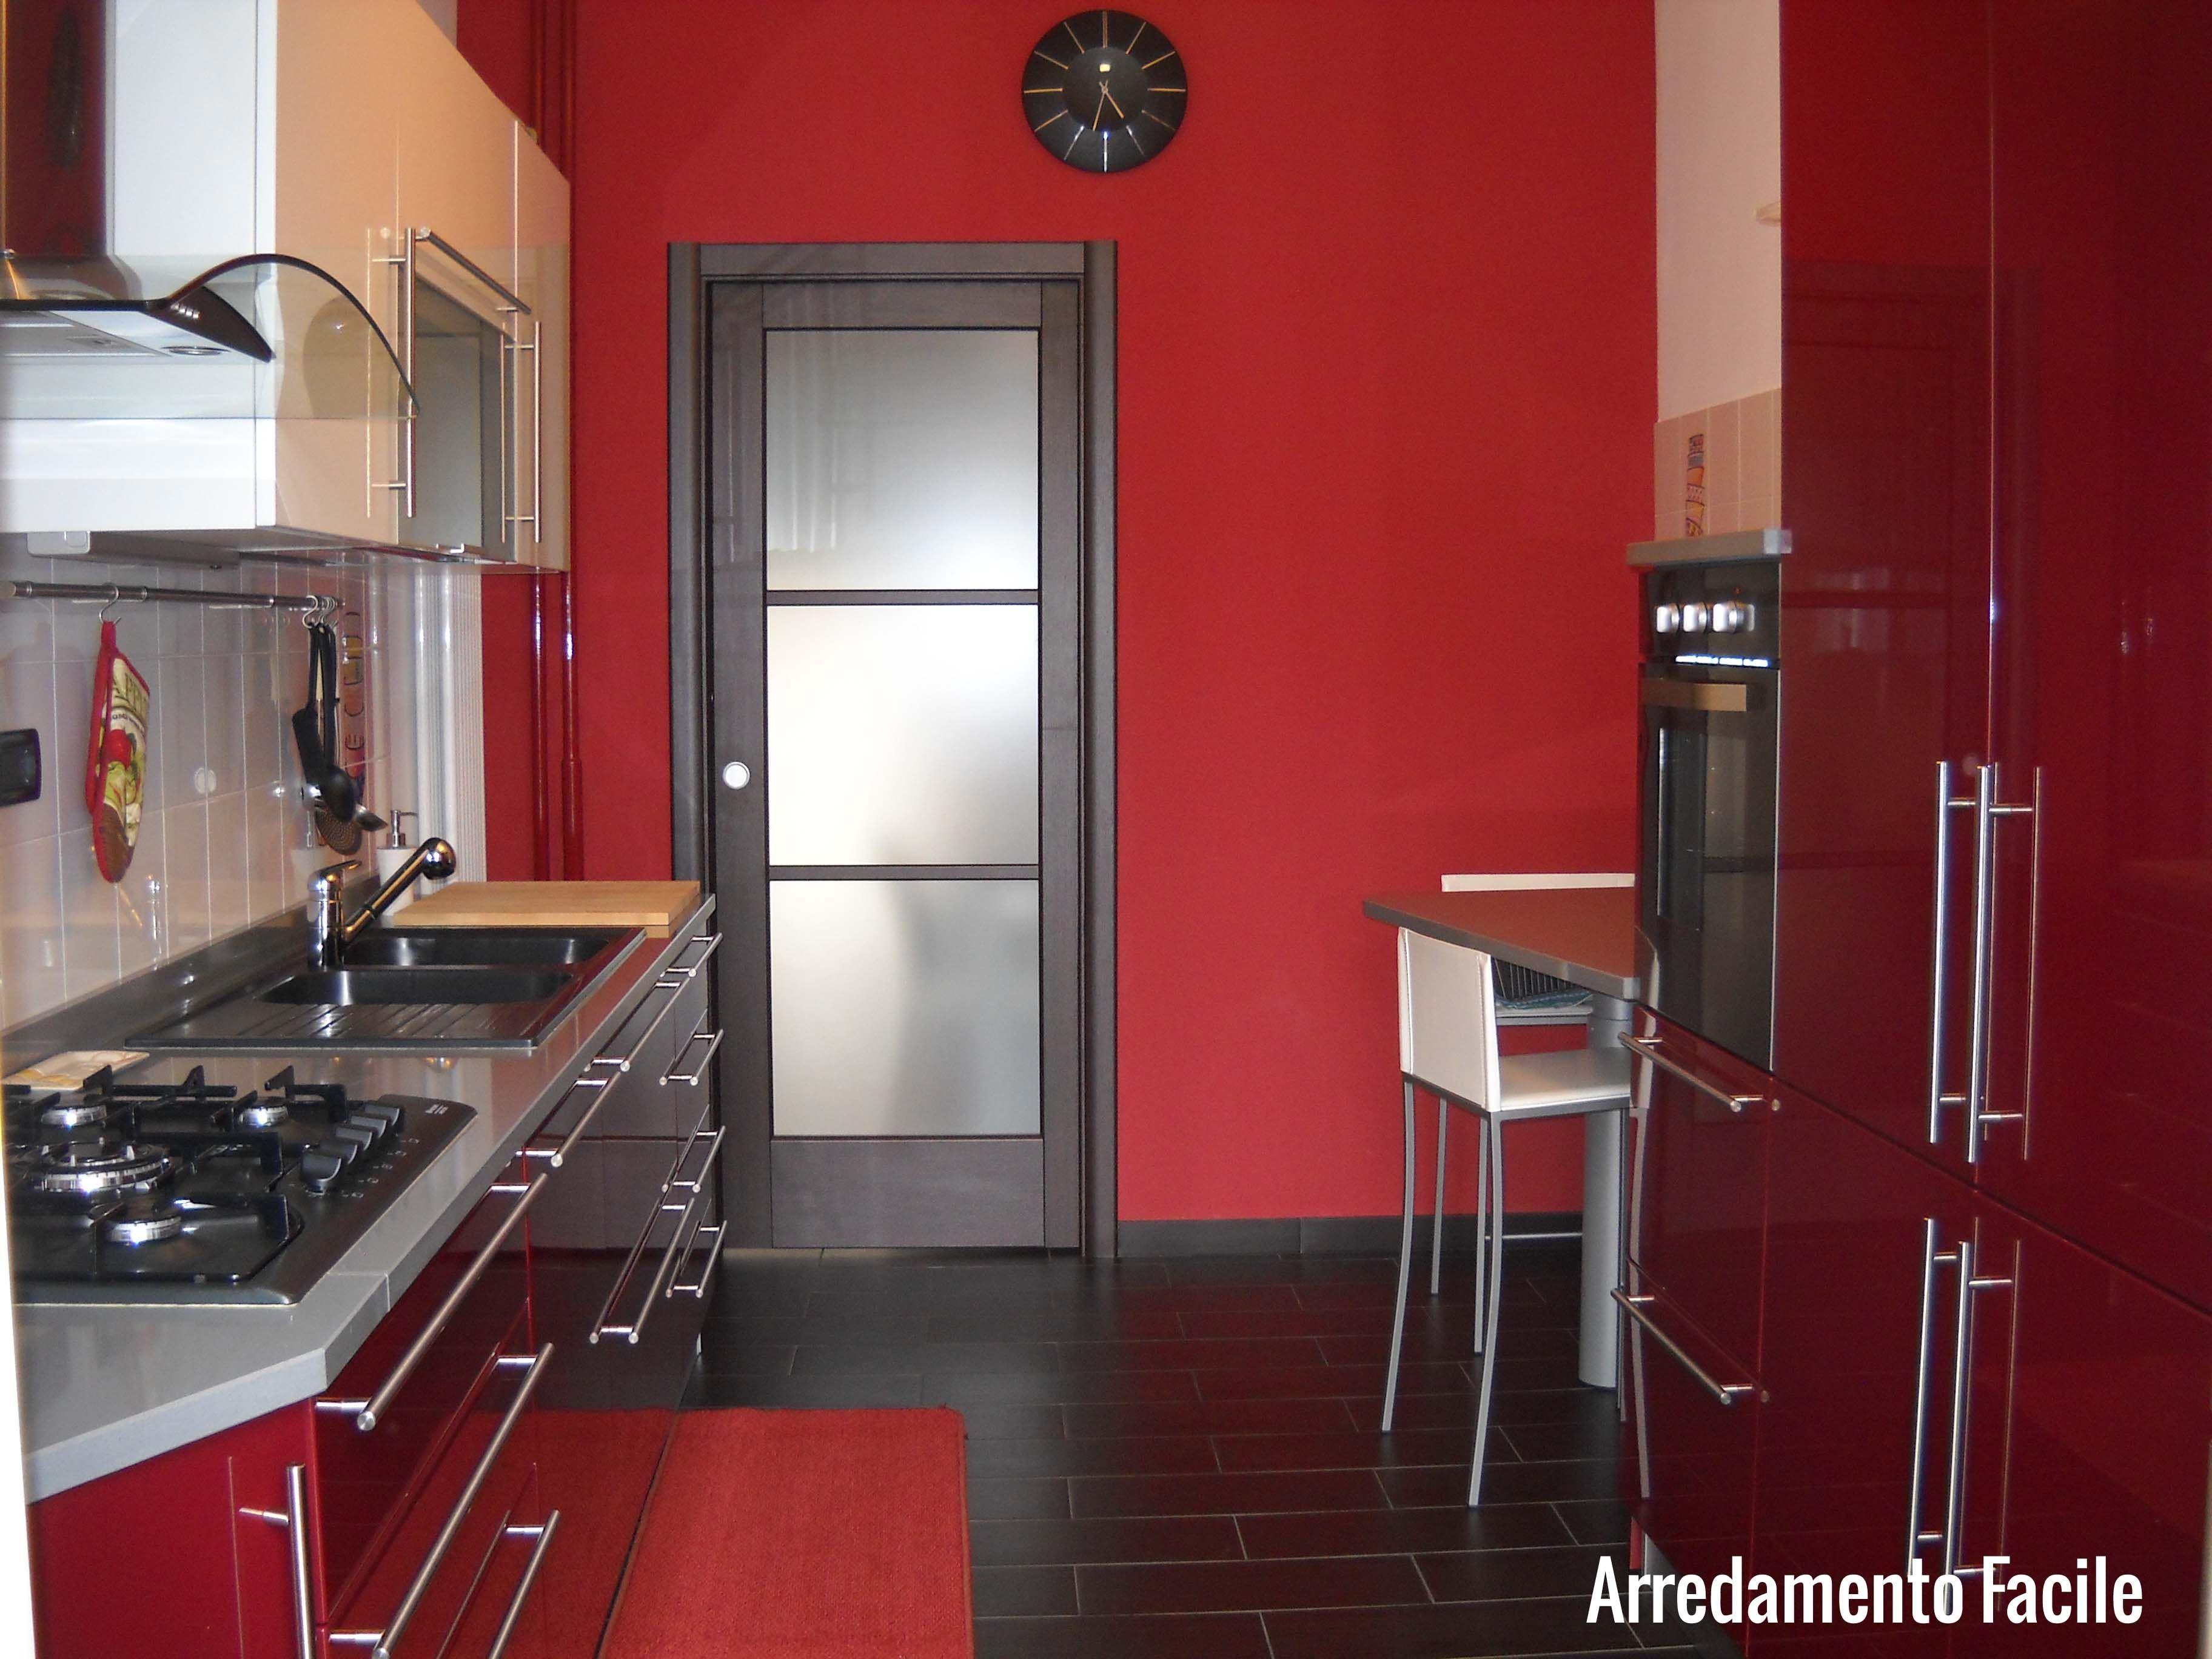 Cucina bordeaux e bianca interno di casa smepool.com